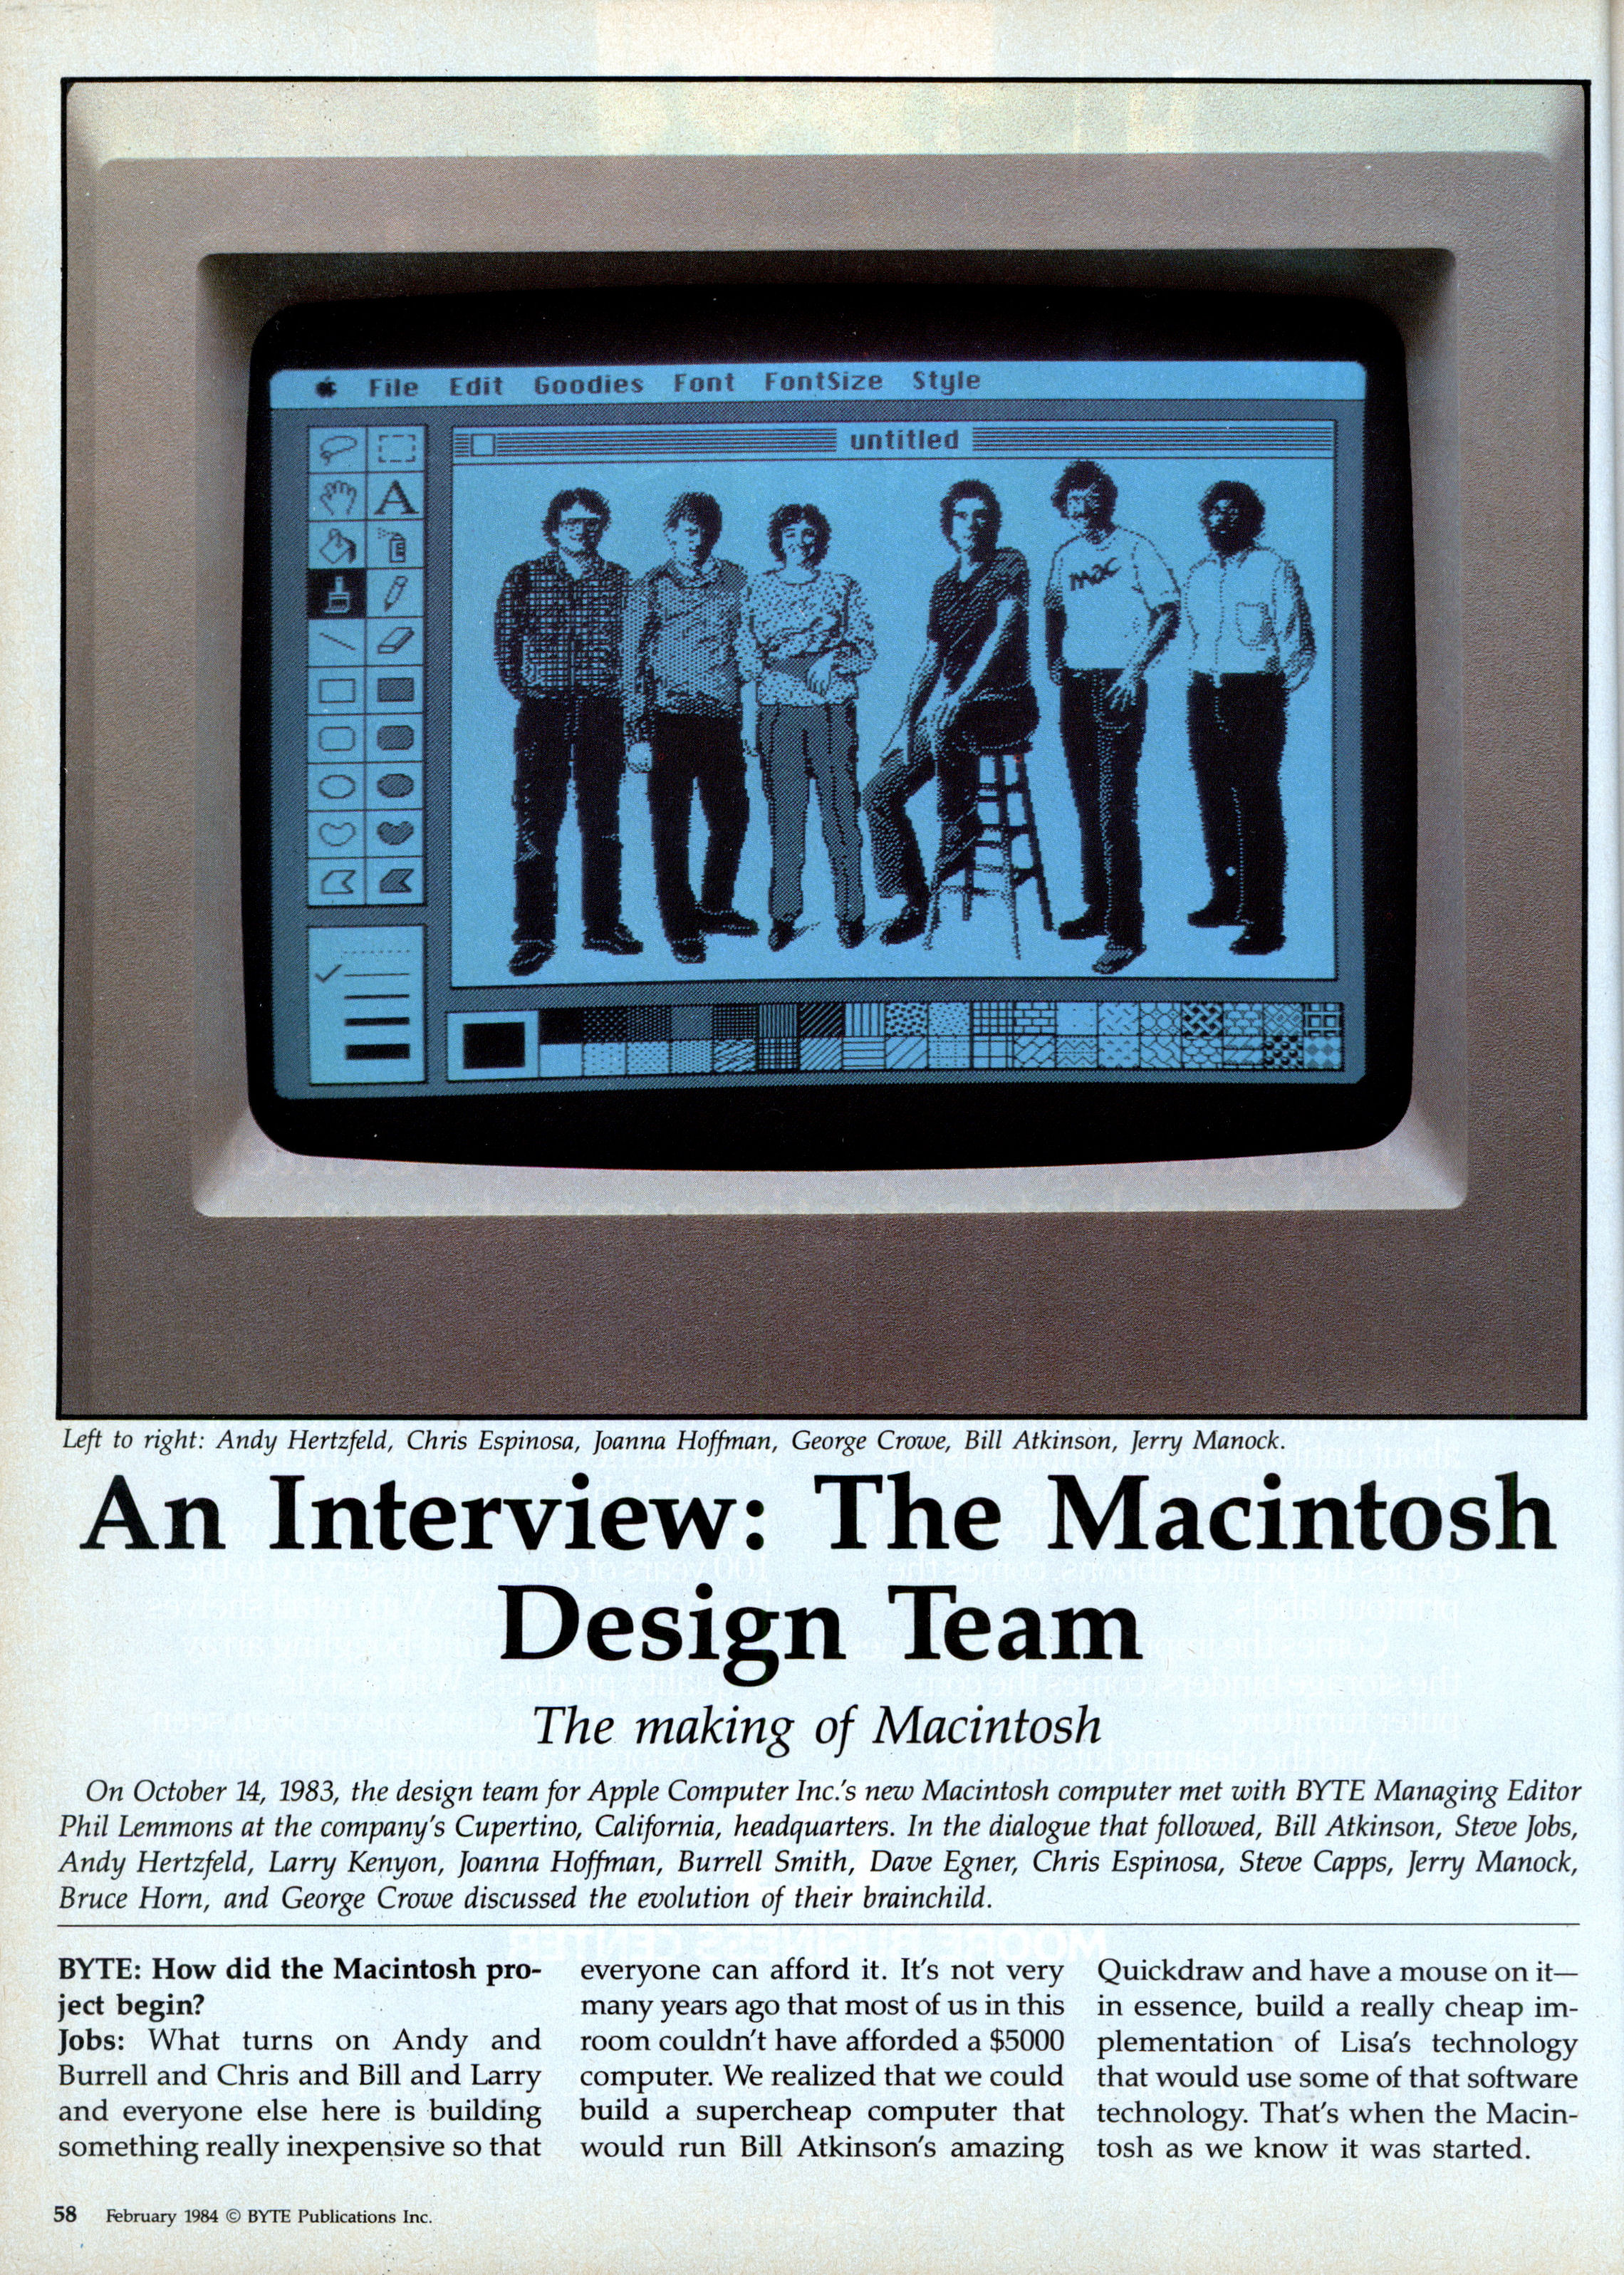 The Making Of Macintosh An Interview With Design Circuit Medic 2012100 Professional Repair Kit 120 Vac Team Feb 1984